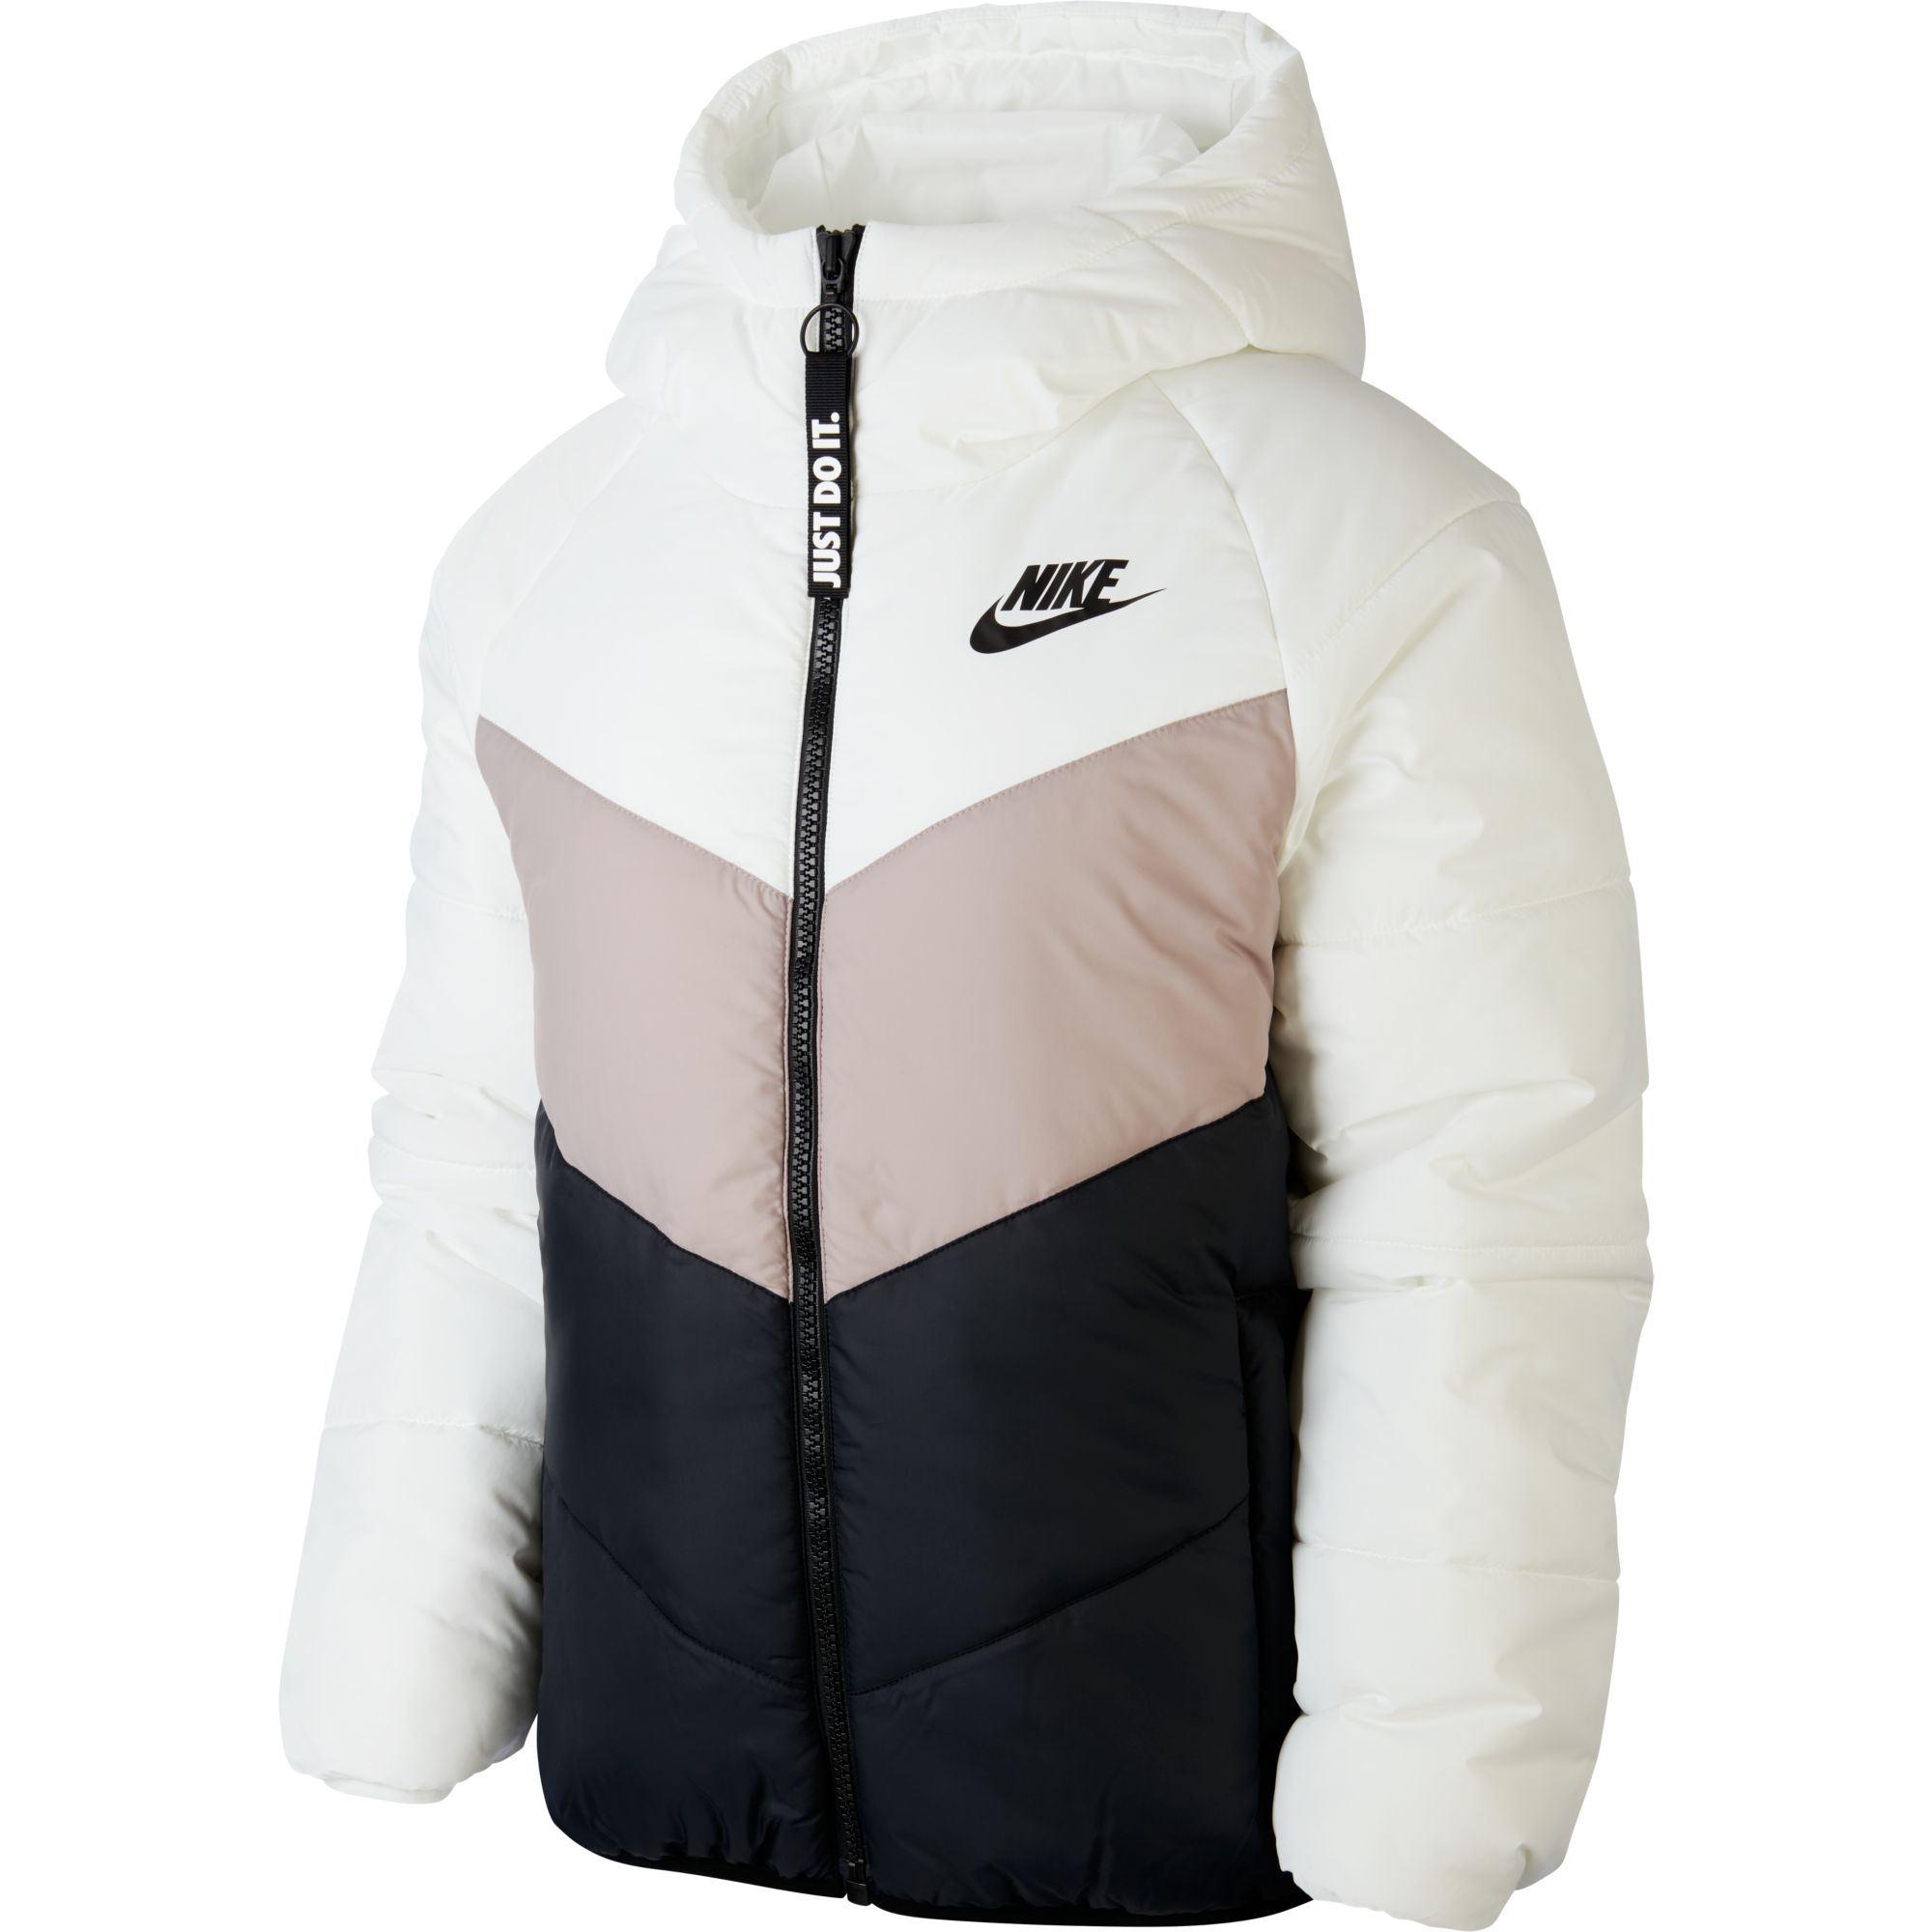 Persona responsable Perder Baño  ᐈ Abrigo Nike Sportswear Windrunner – Black Atmosfera©